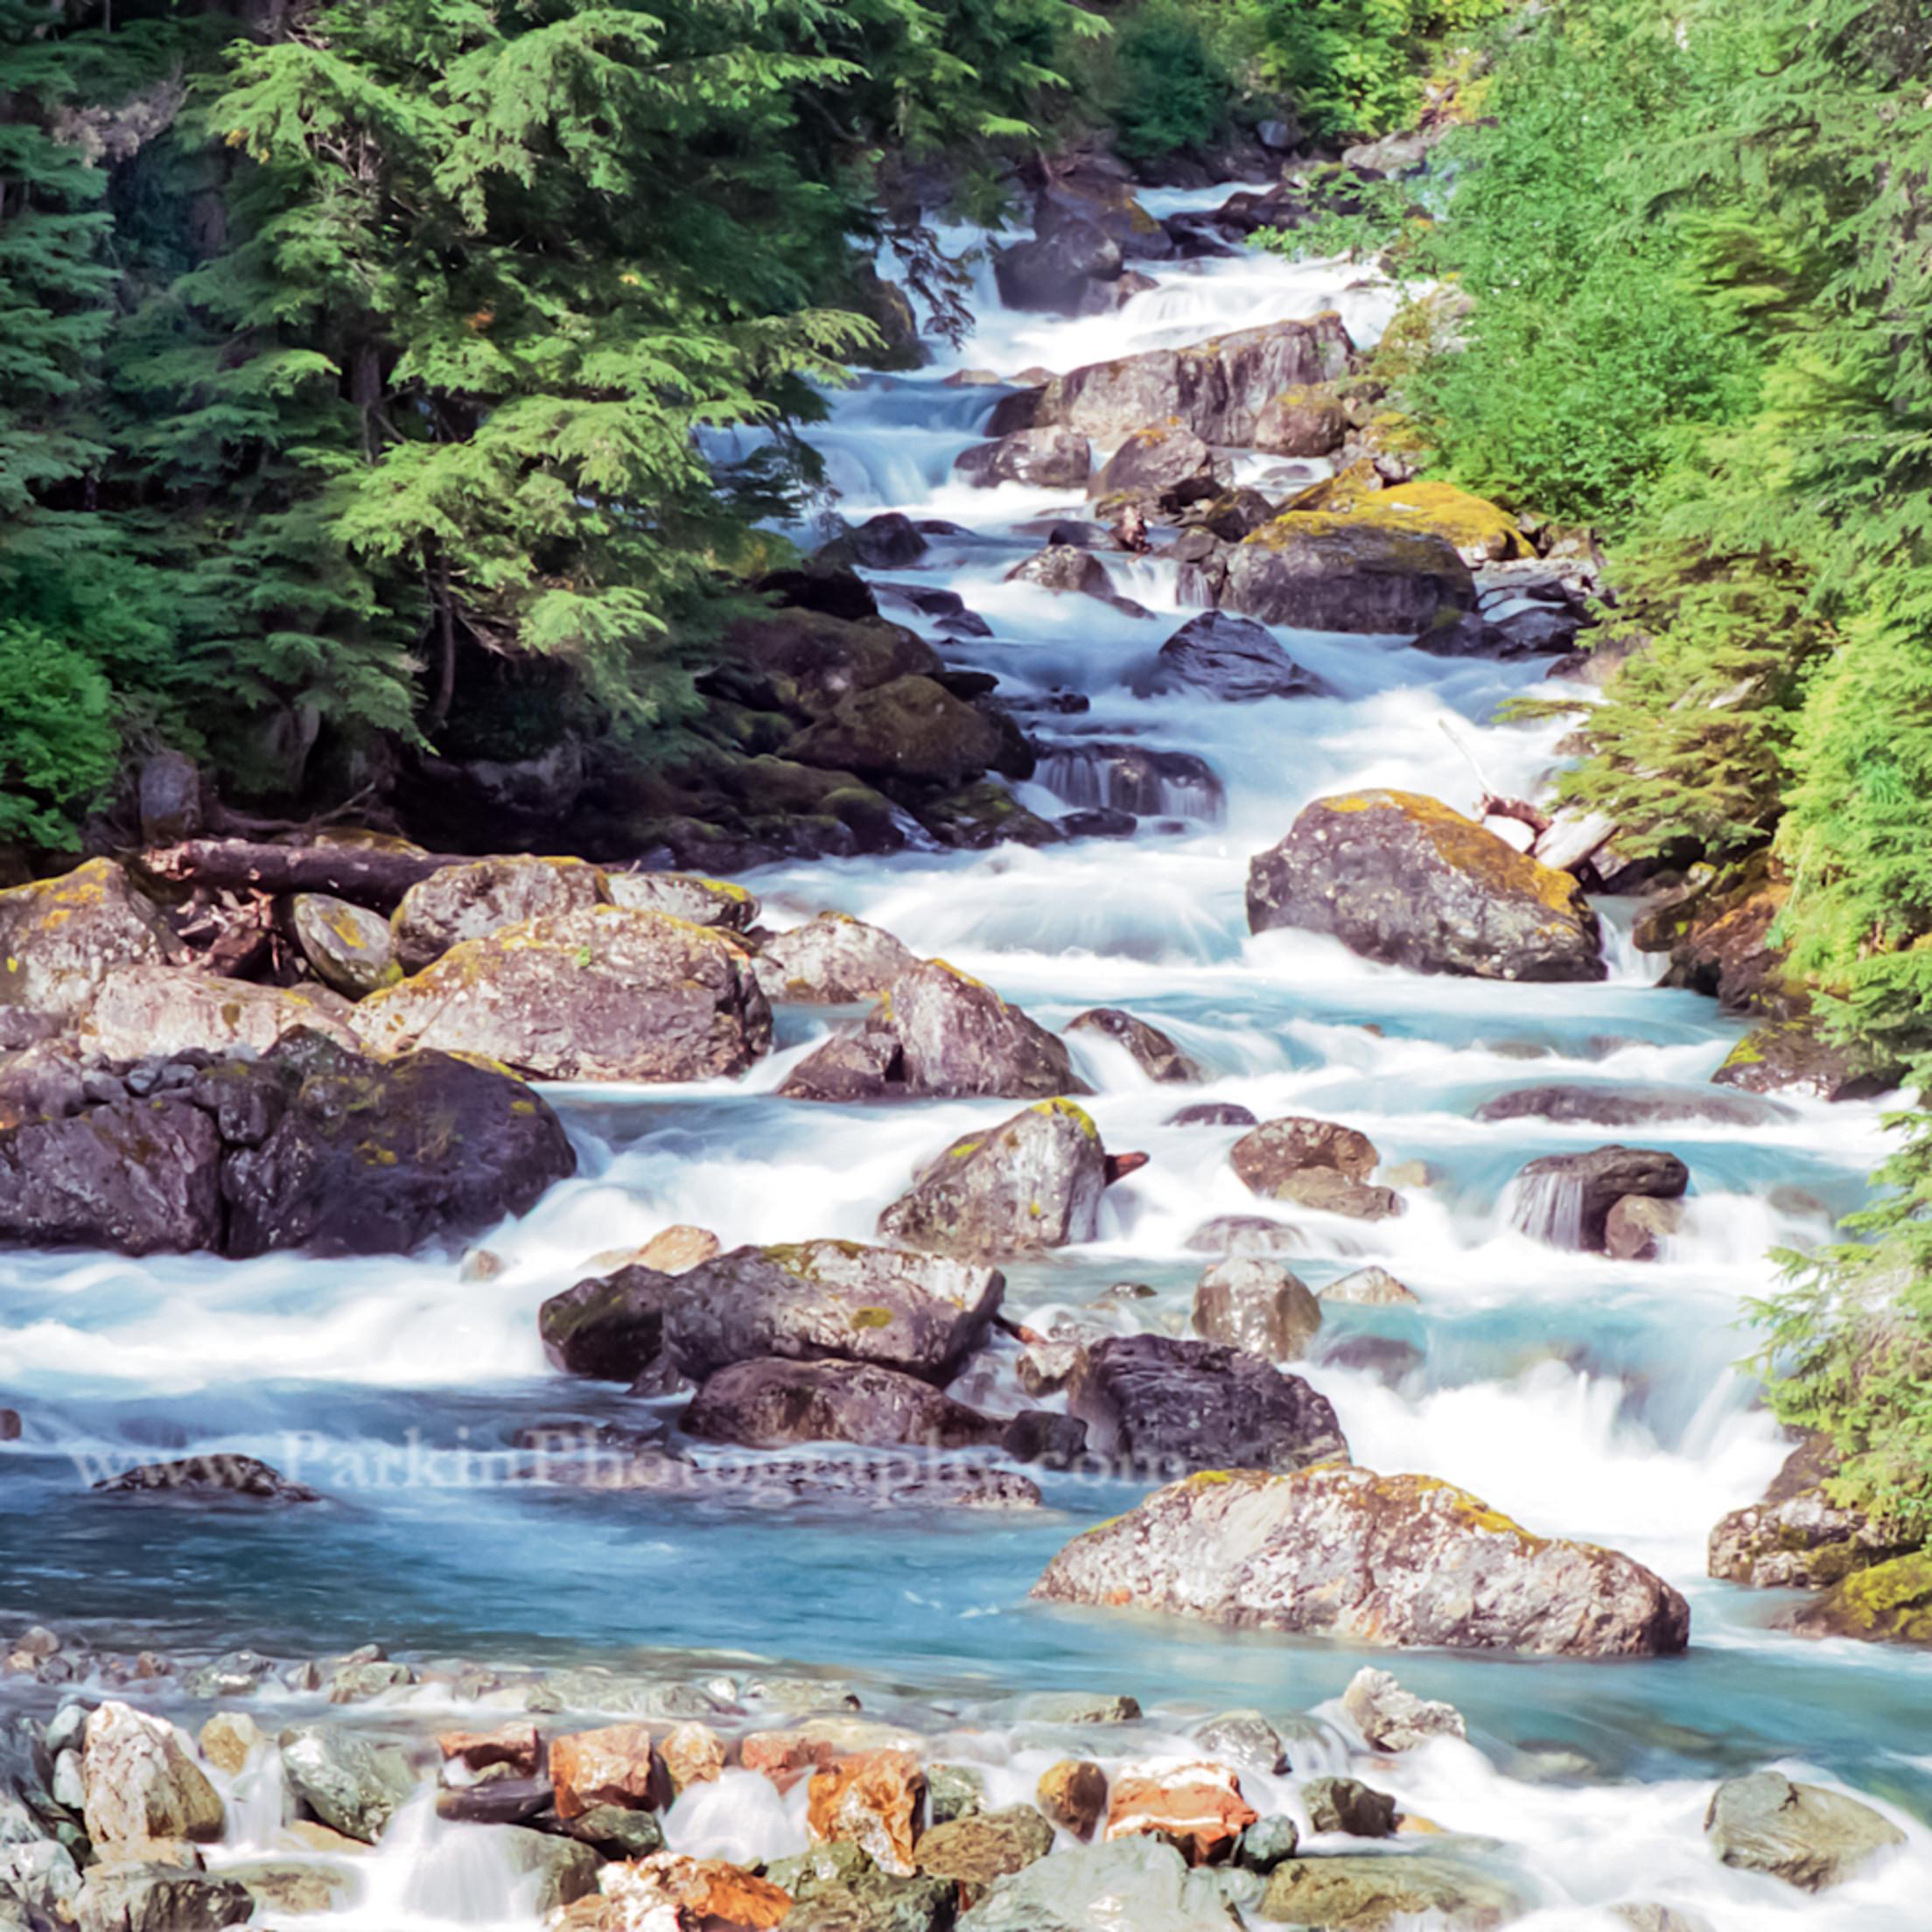 Hyder waterfall 5 ak69 21 asf kyicek